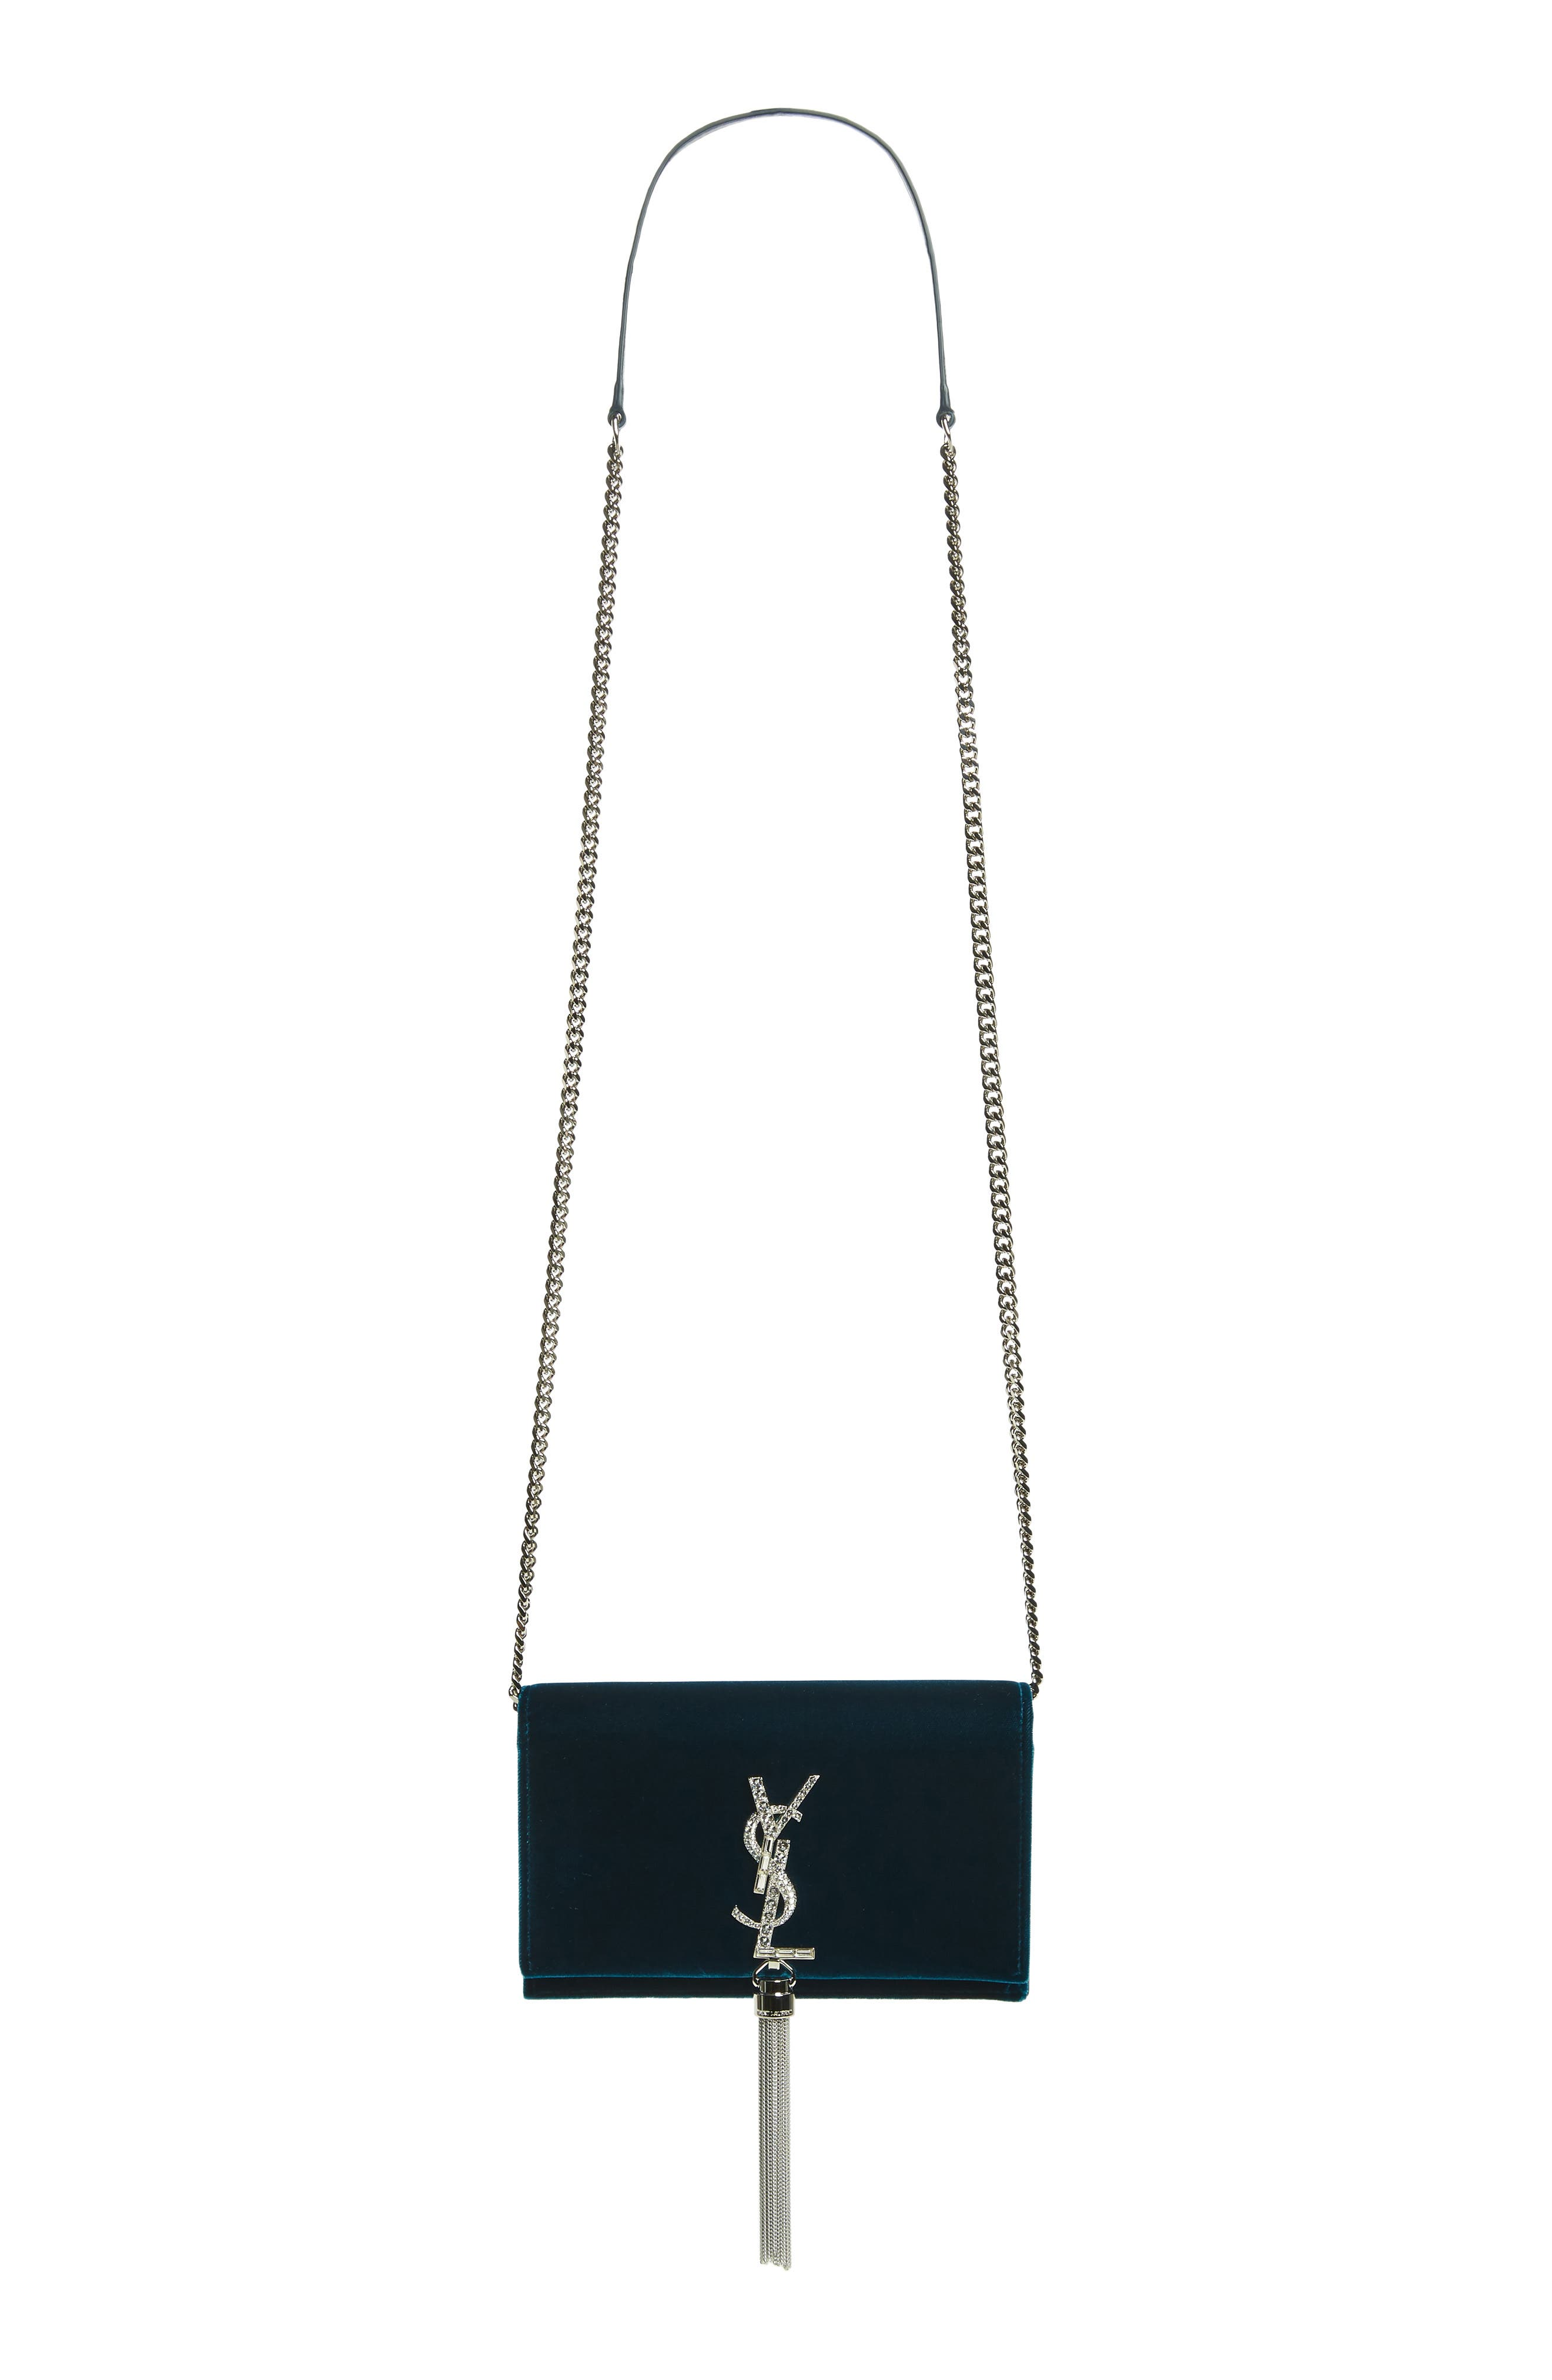 SAINT LAURENT, Small Kate Crystal Logo Wallet on a Chain, Main thumbnail 1, color, DARK DEEP SEA/ CRISTAL